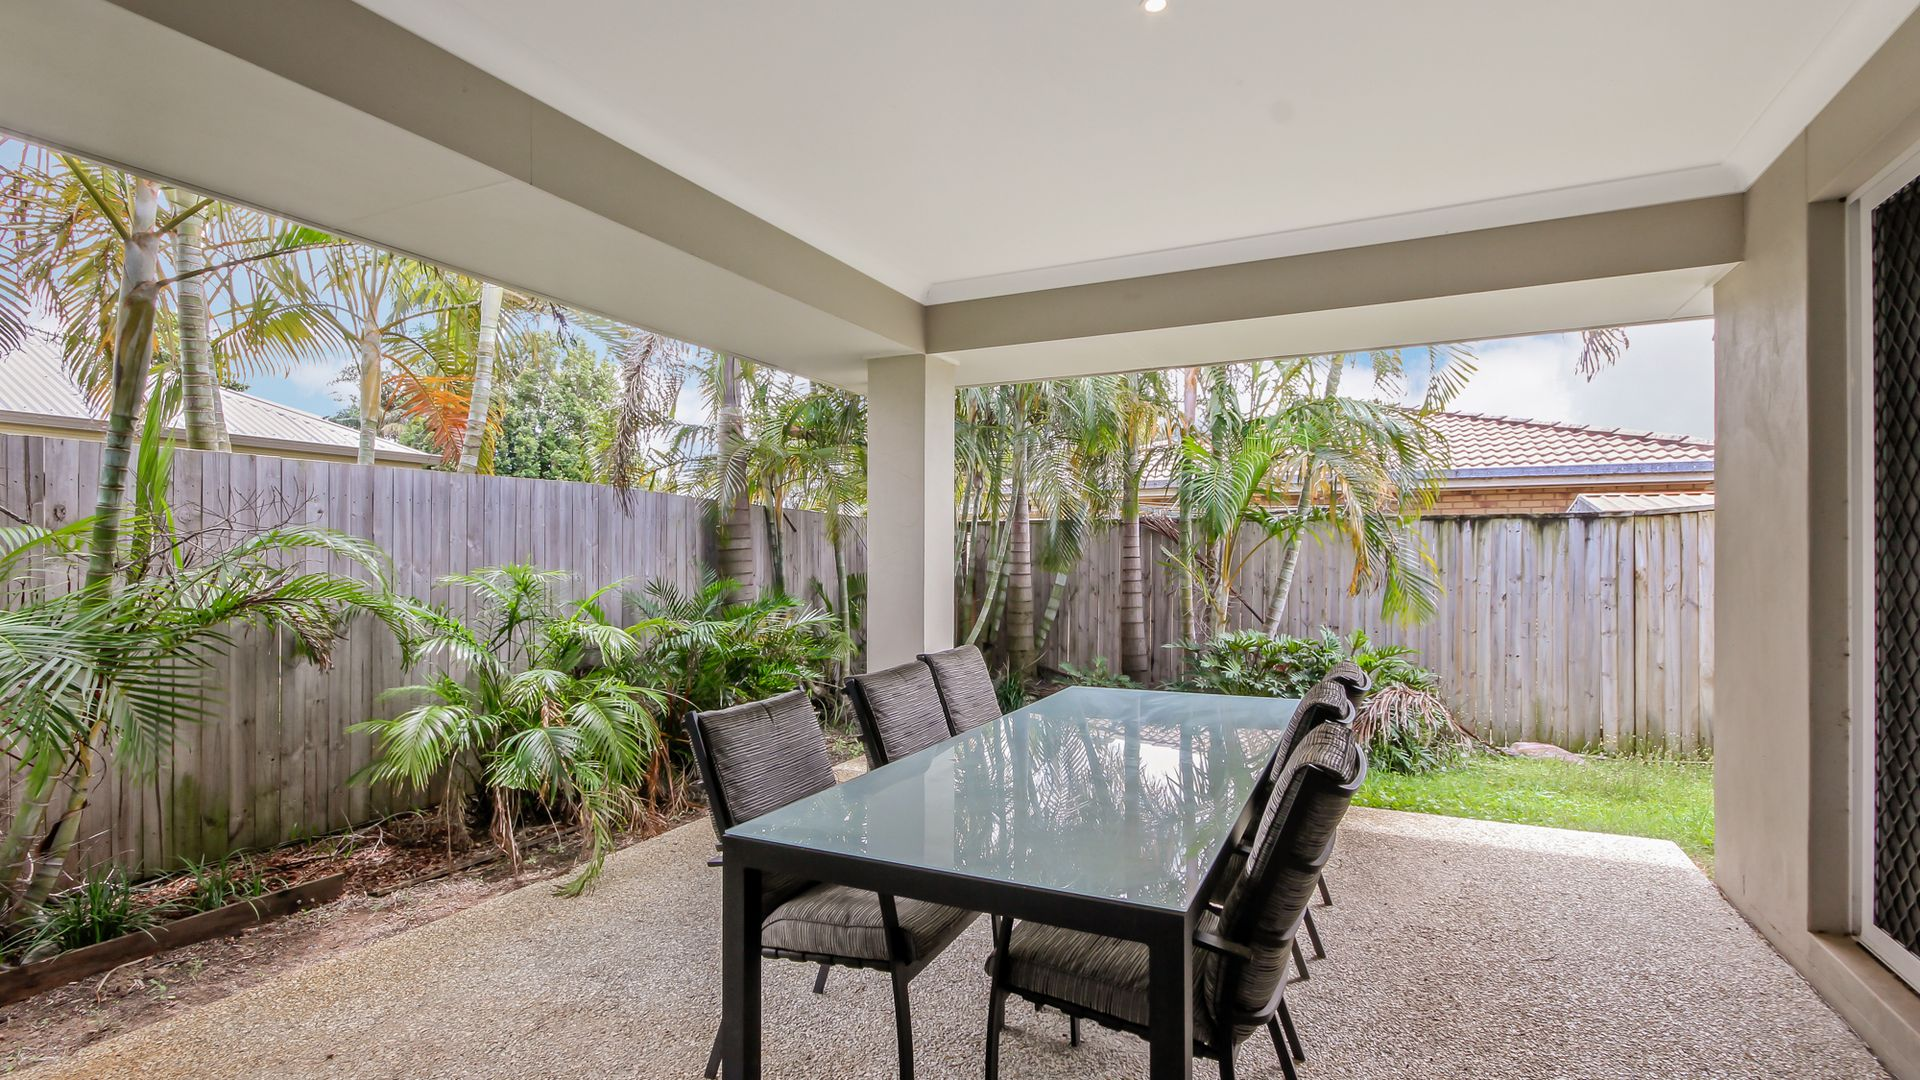 9 Parklane Road, Victoria Point QLD 4165, Image 1